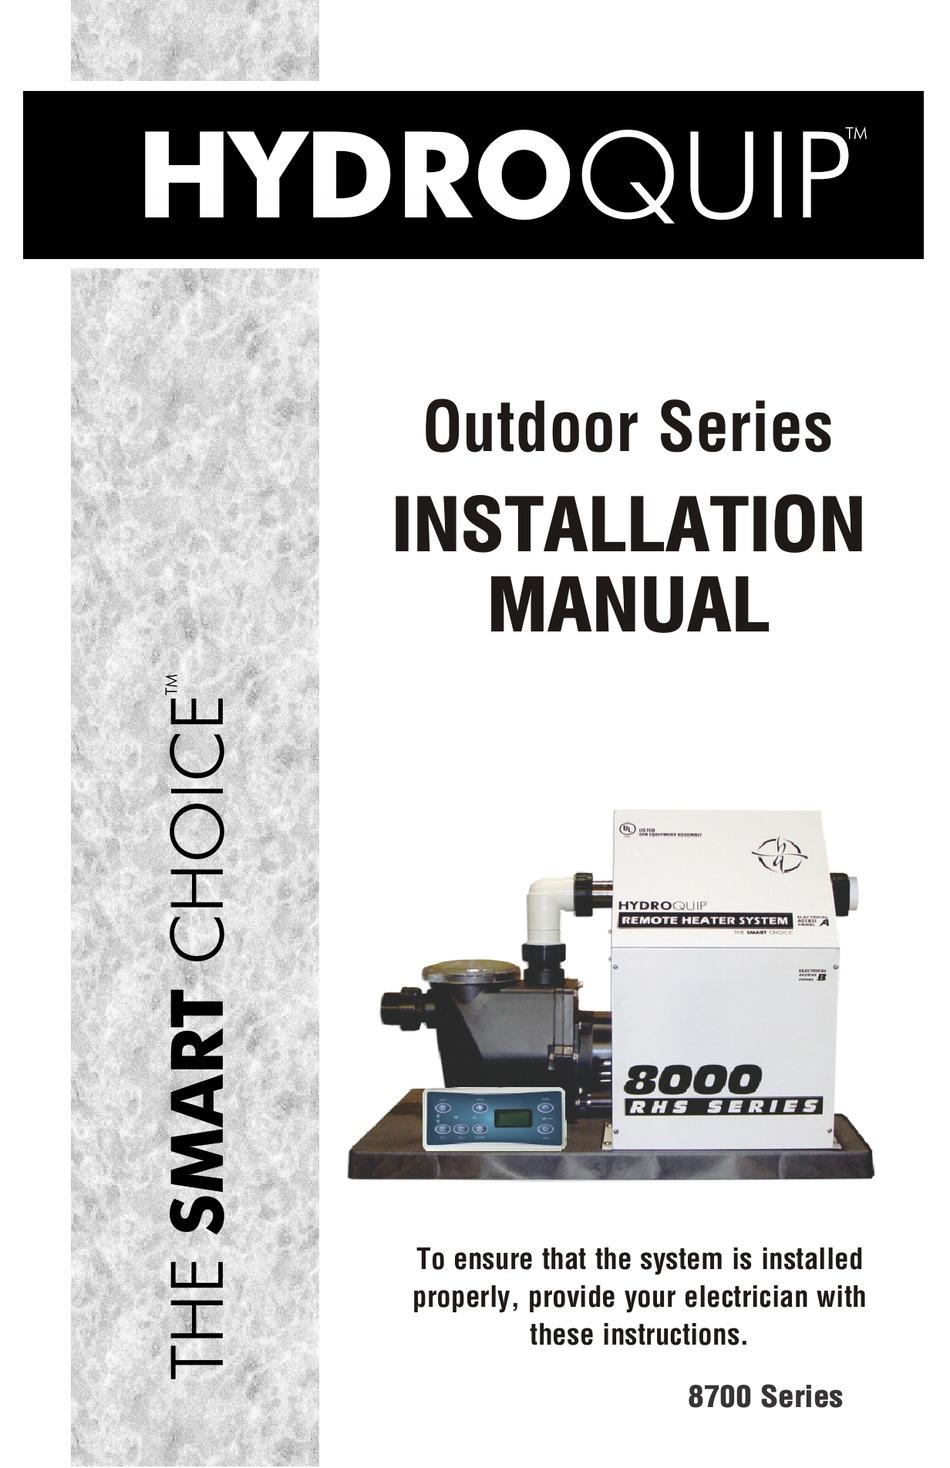 HYDROQUIP OUTDOOR SERIES INSTALLATION MANUAL Pdf Download | ManualsLib | Hydro Quip Heater Wiring Schematics |  | ManualsLib